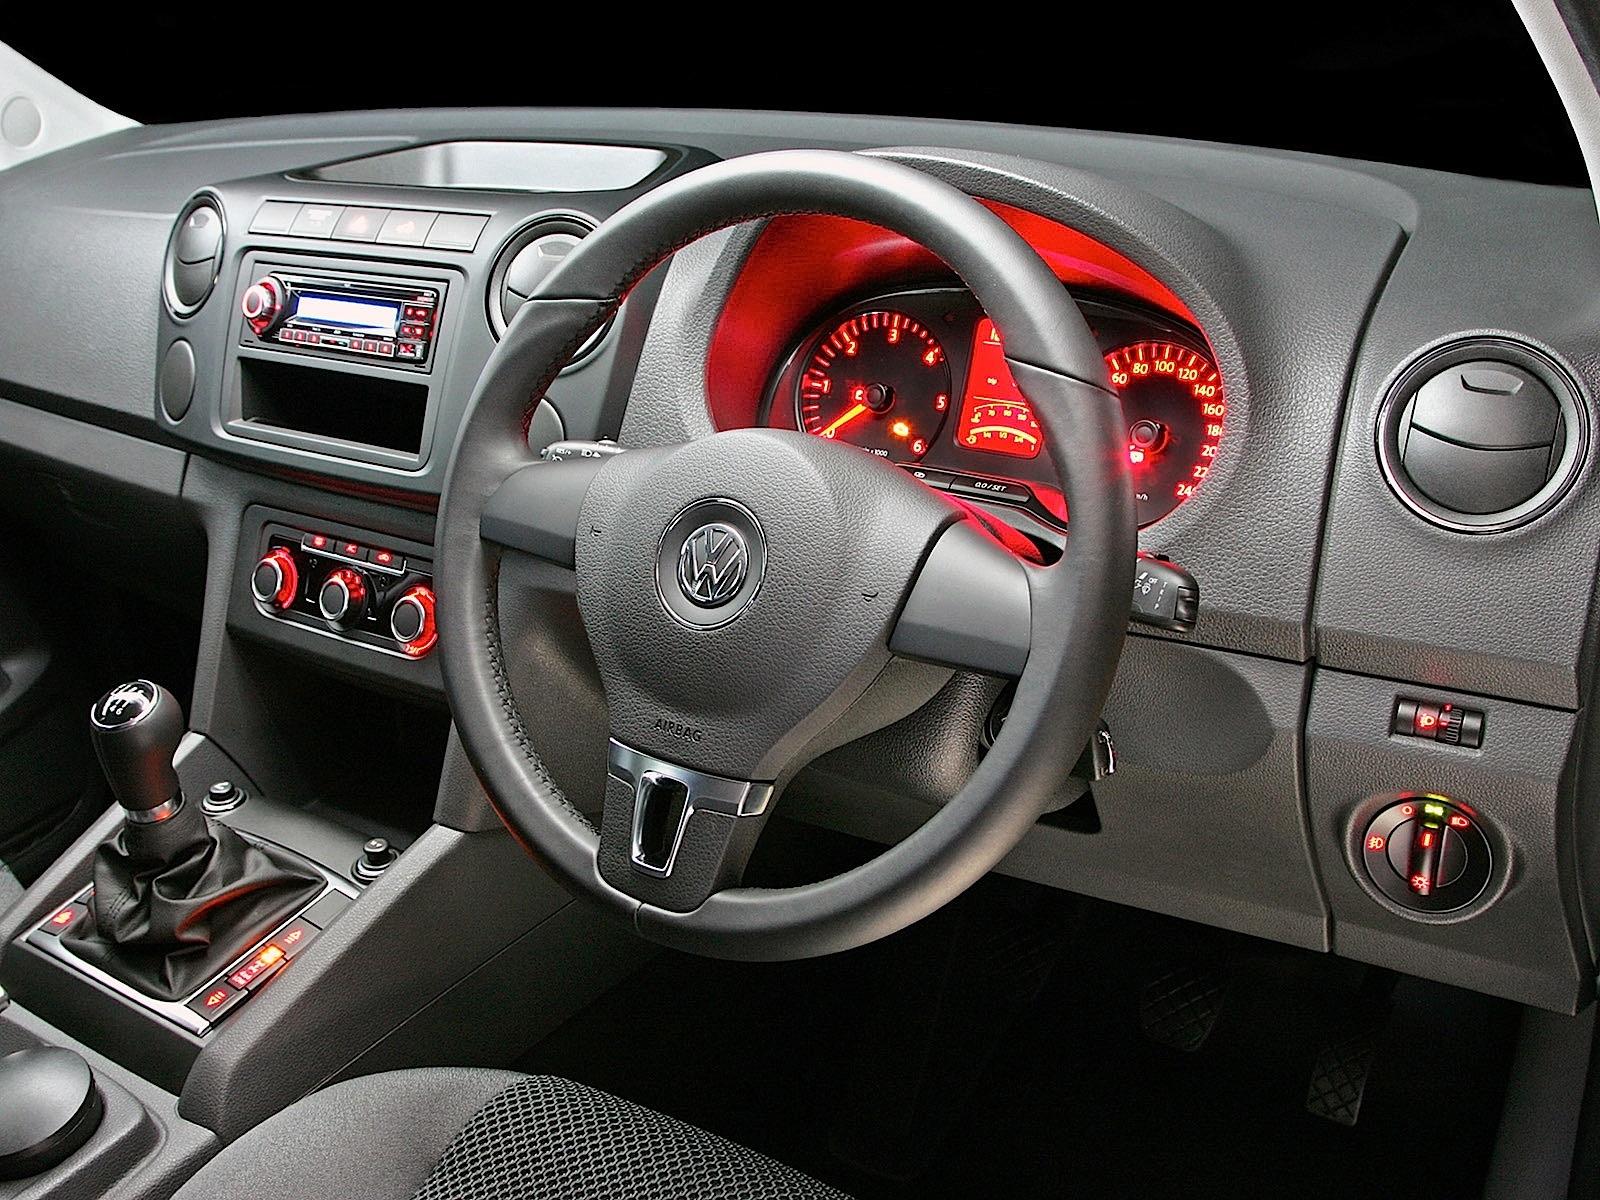 VOLKSWAGEN Amarok Single Cab specs - 2011, 2012, 2013, 2014, 2015, 2016 - autoevolution